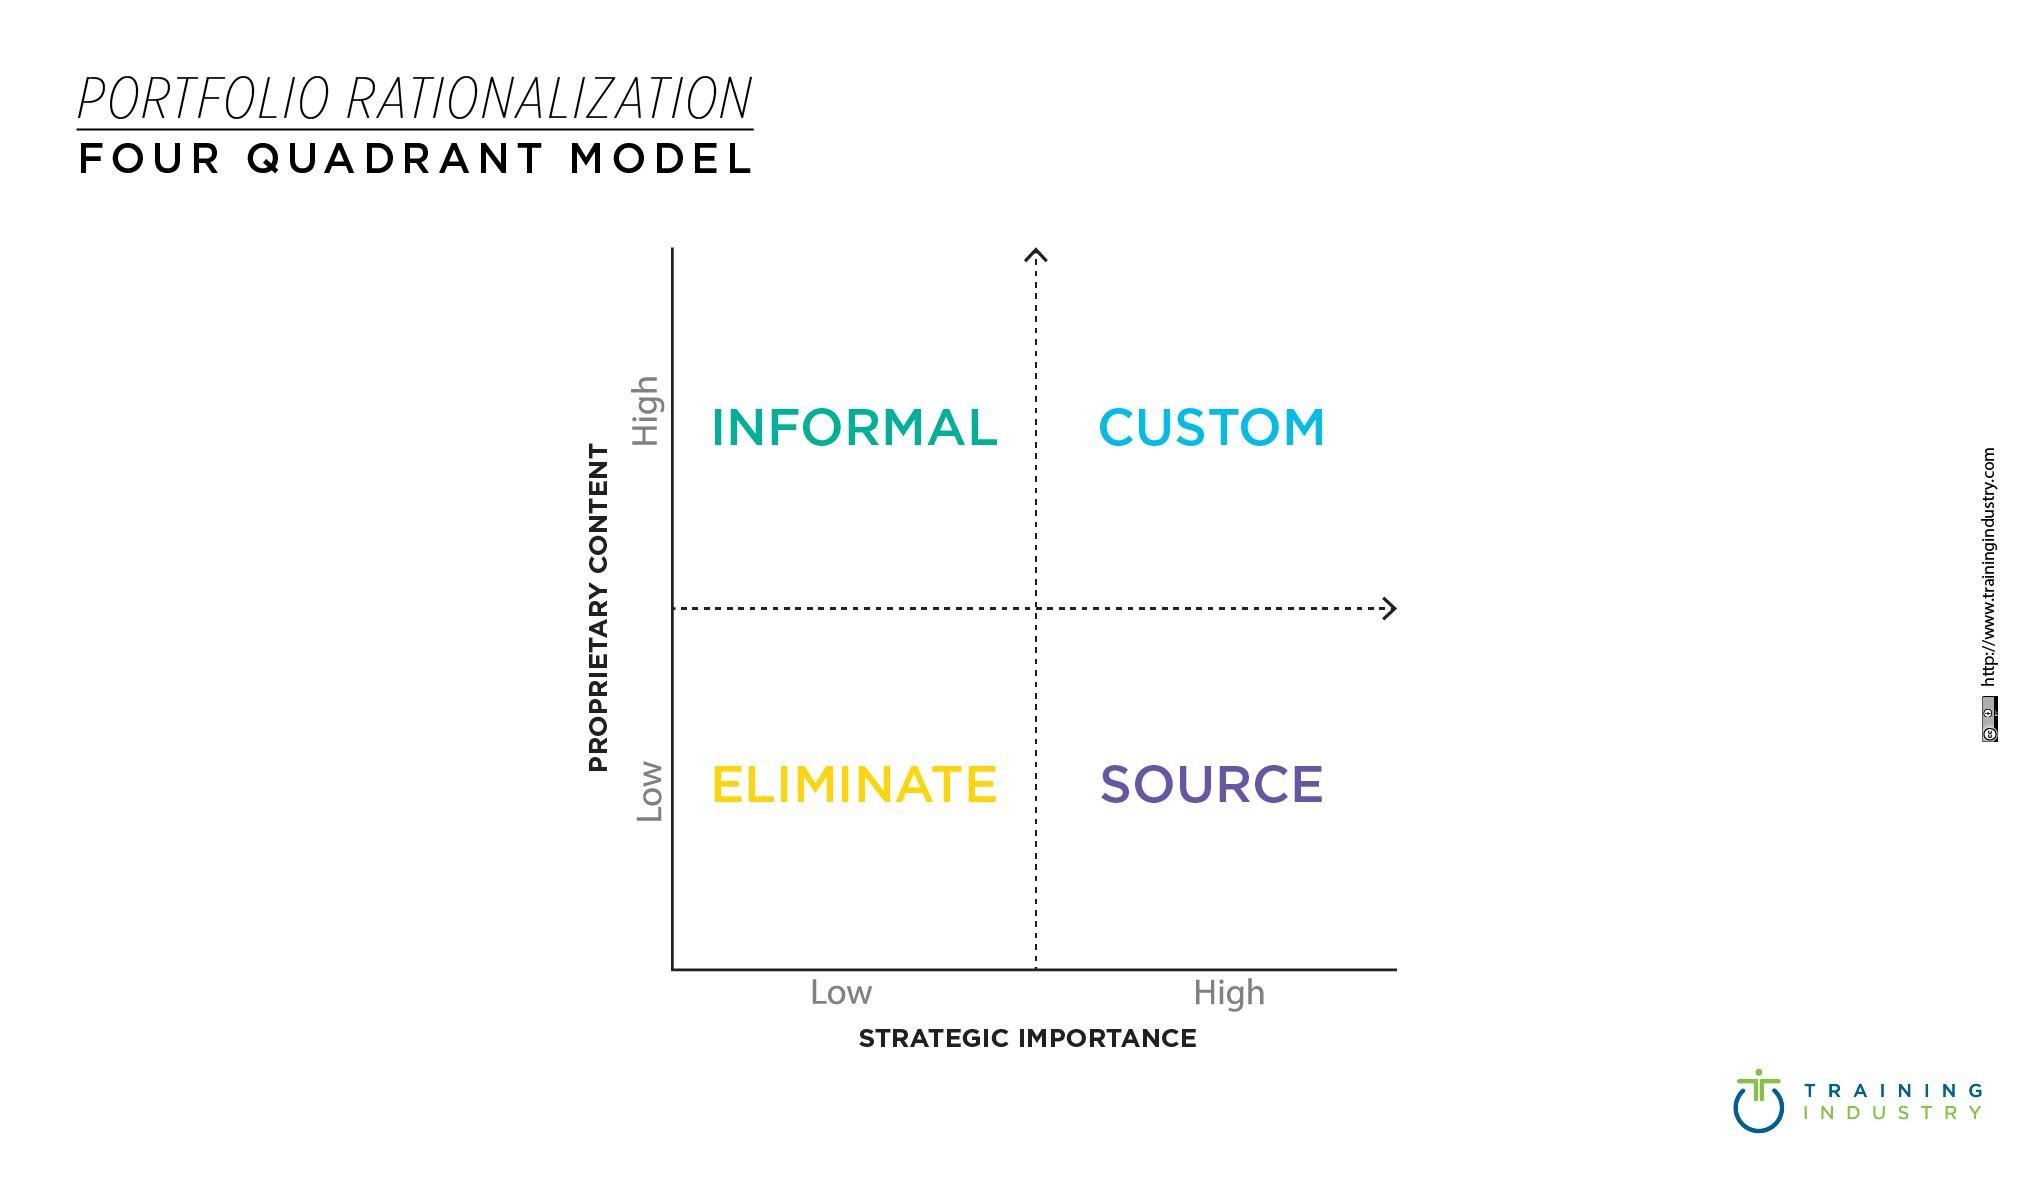 Portfolio Rationalization Four Quadrants Model _485x 284